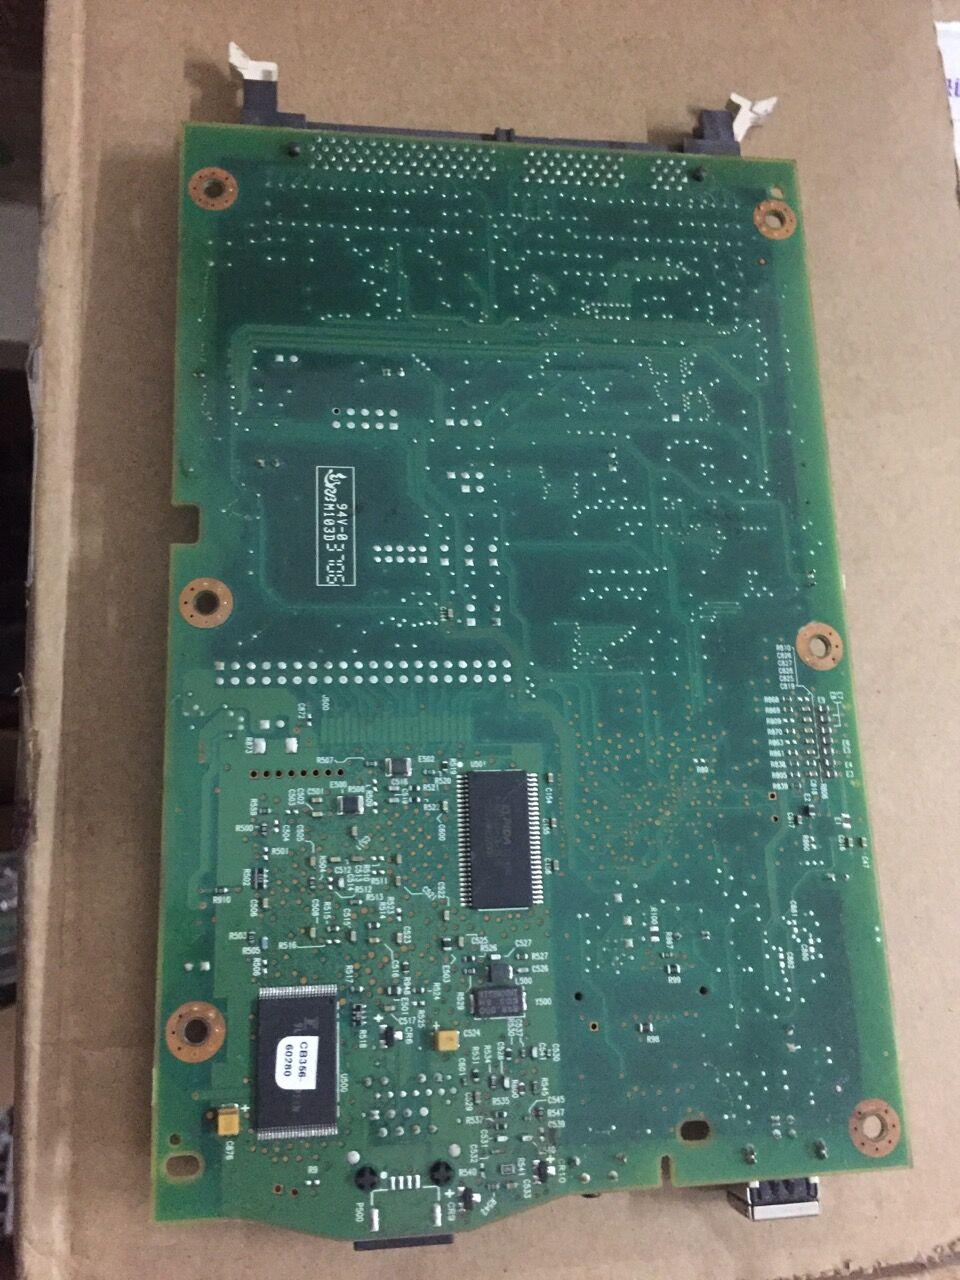 q3697 60001 q3697 67901 cb356 67901 para hp laserjet 1320n 01